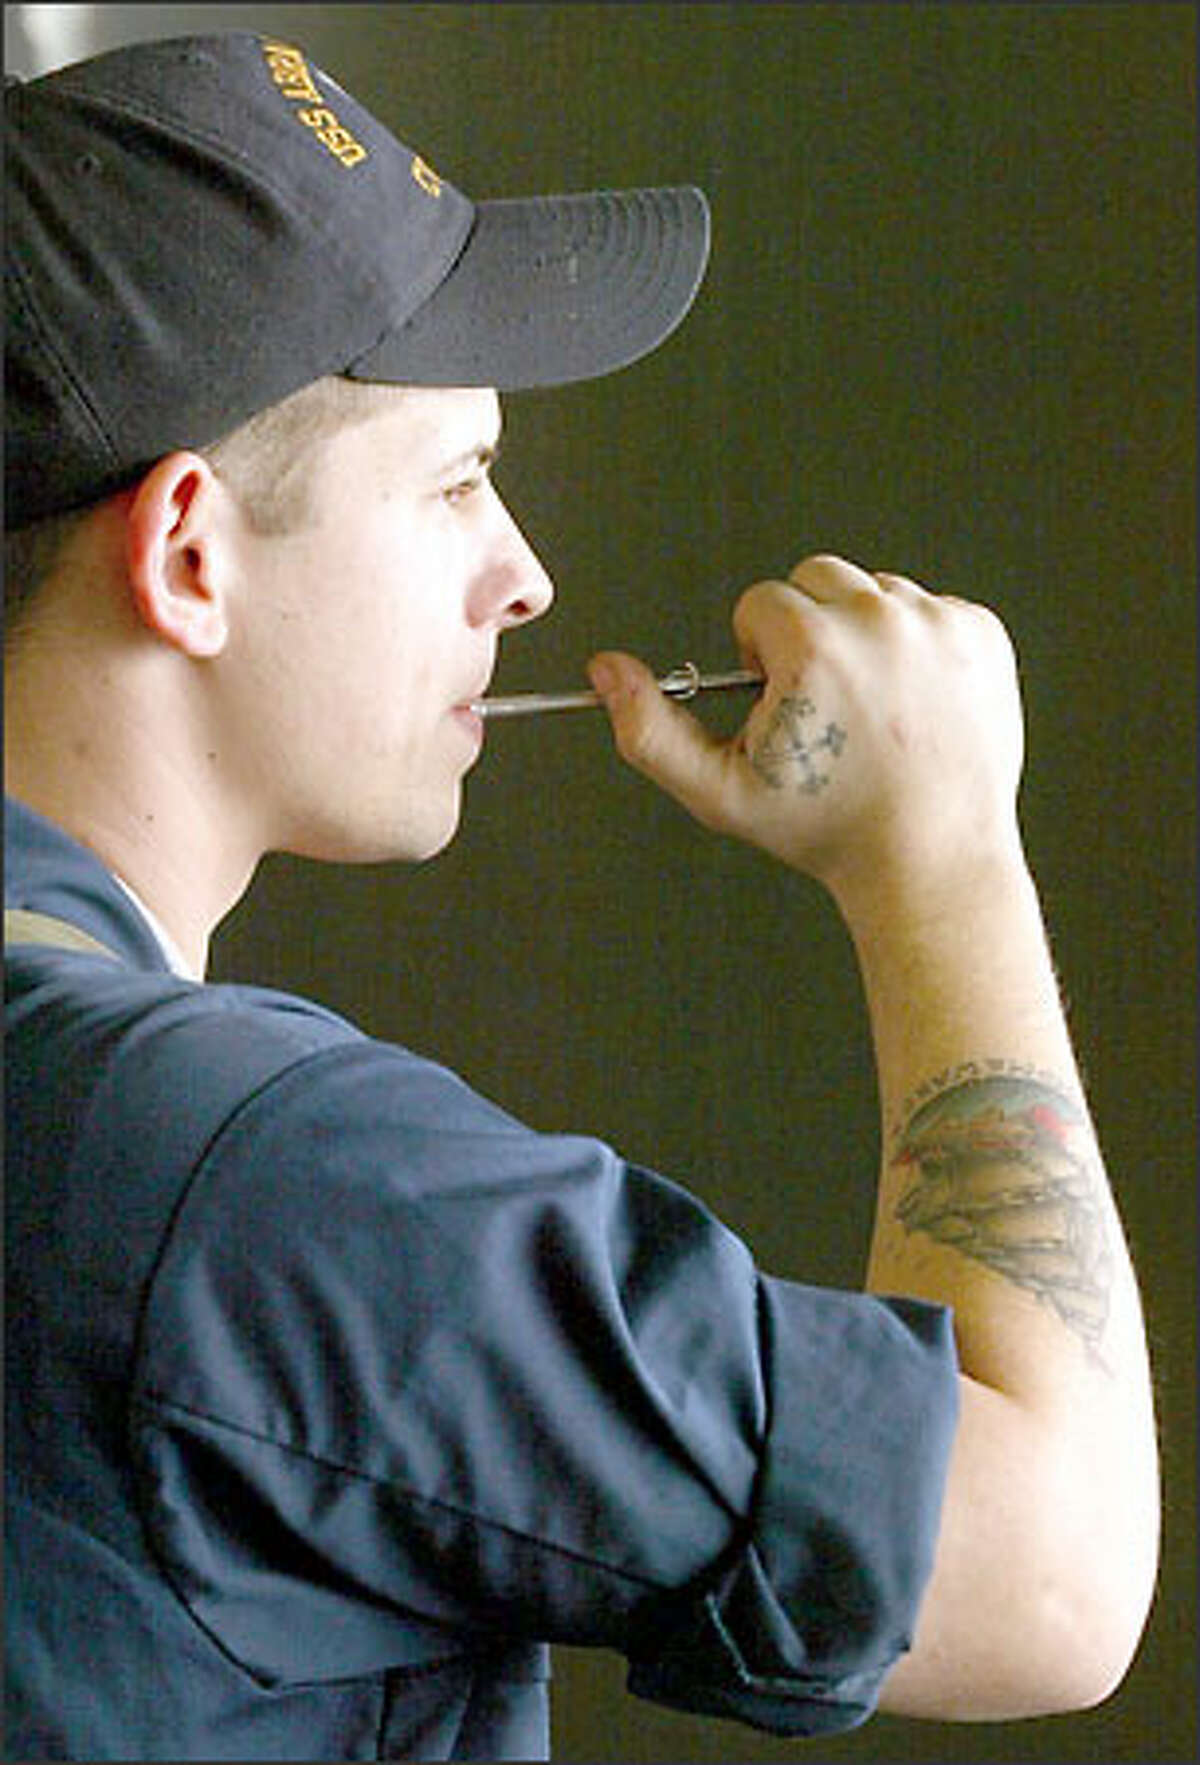 Boatswain's Mate David Slodysko, 25, from Shamokin, Pa. The tradition of pipe